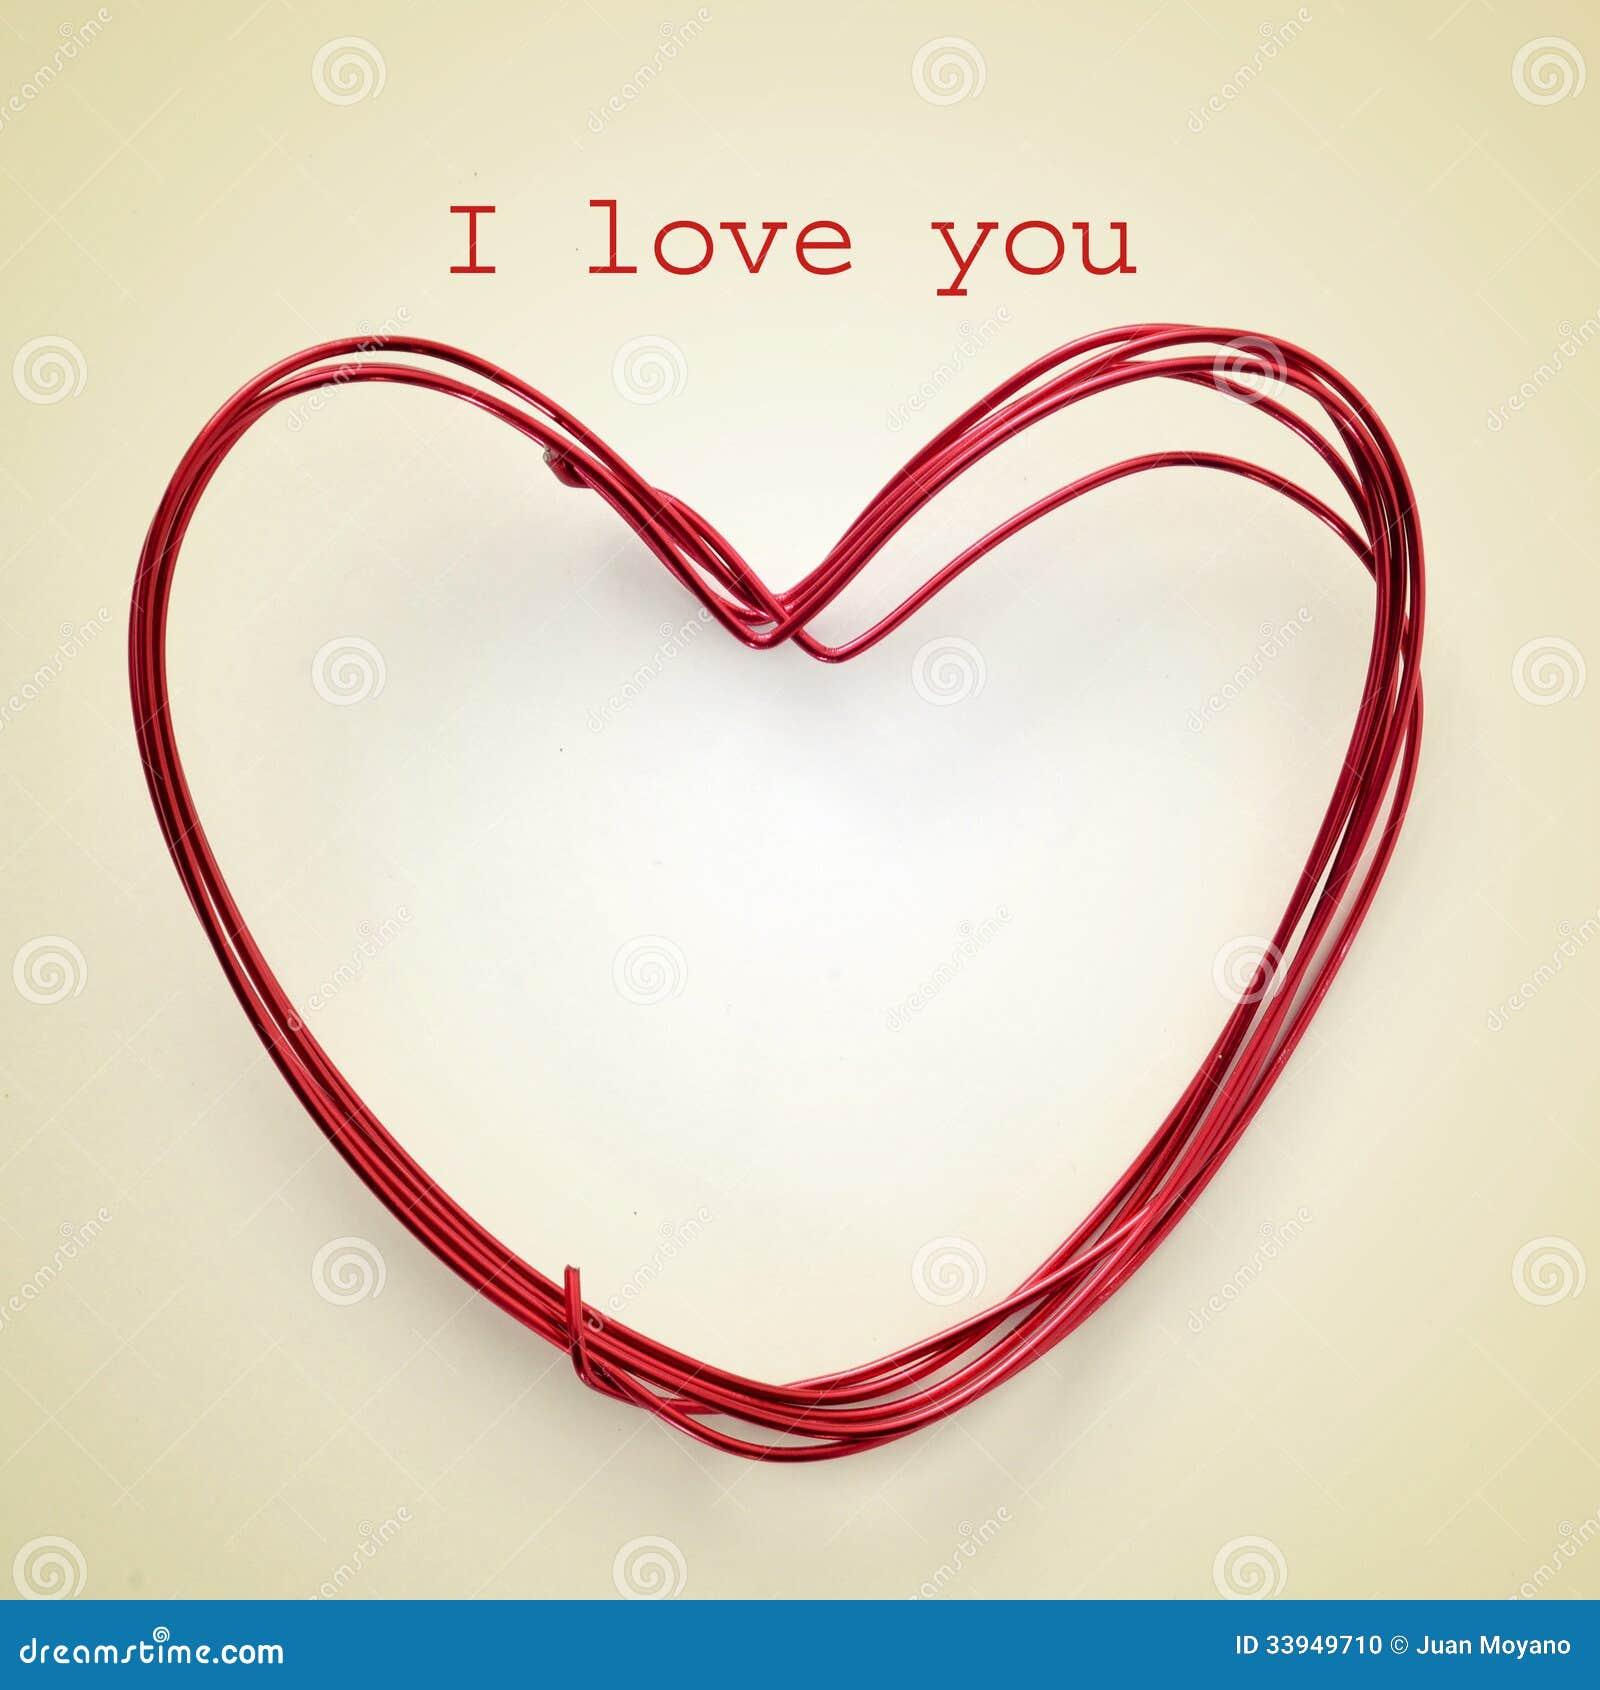 I love you stock photo  Image of design, effect, congratulate - 33949710